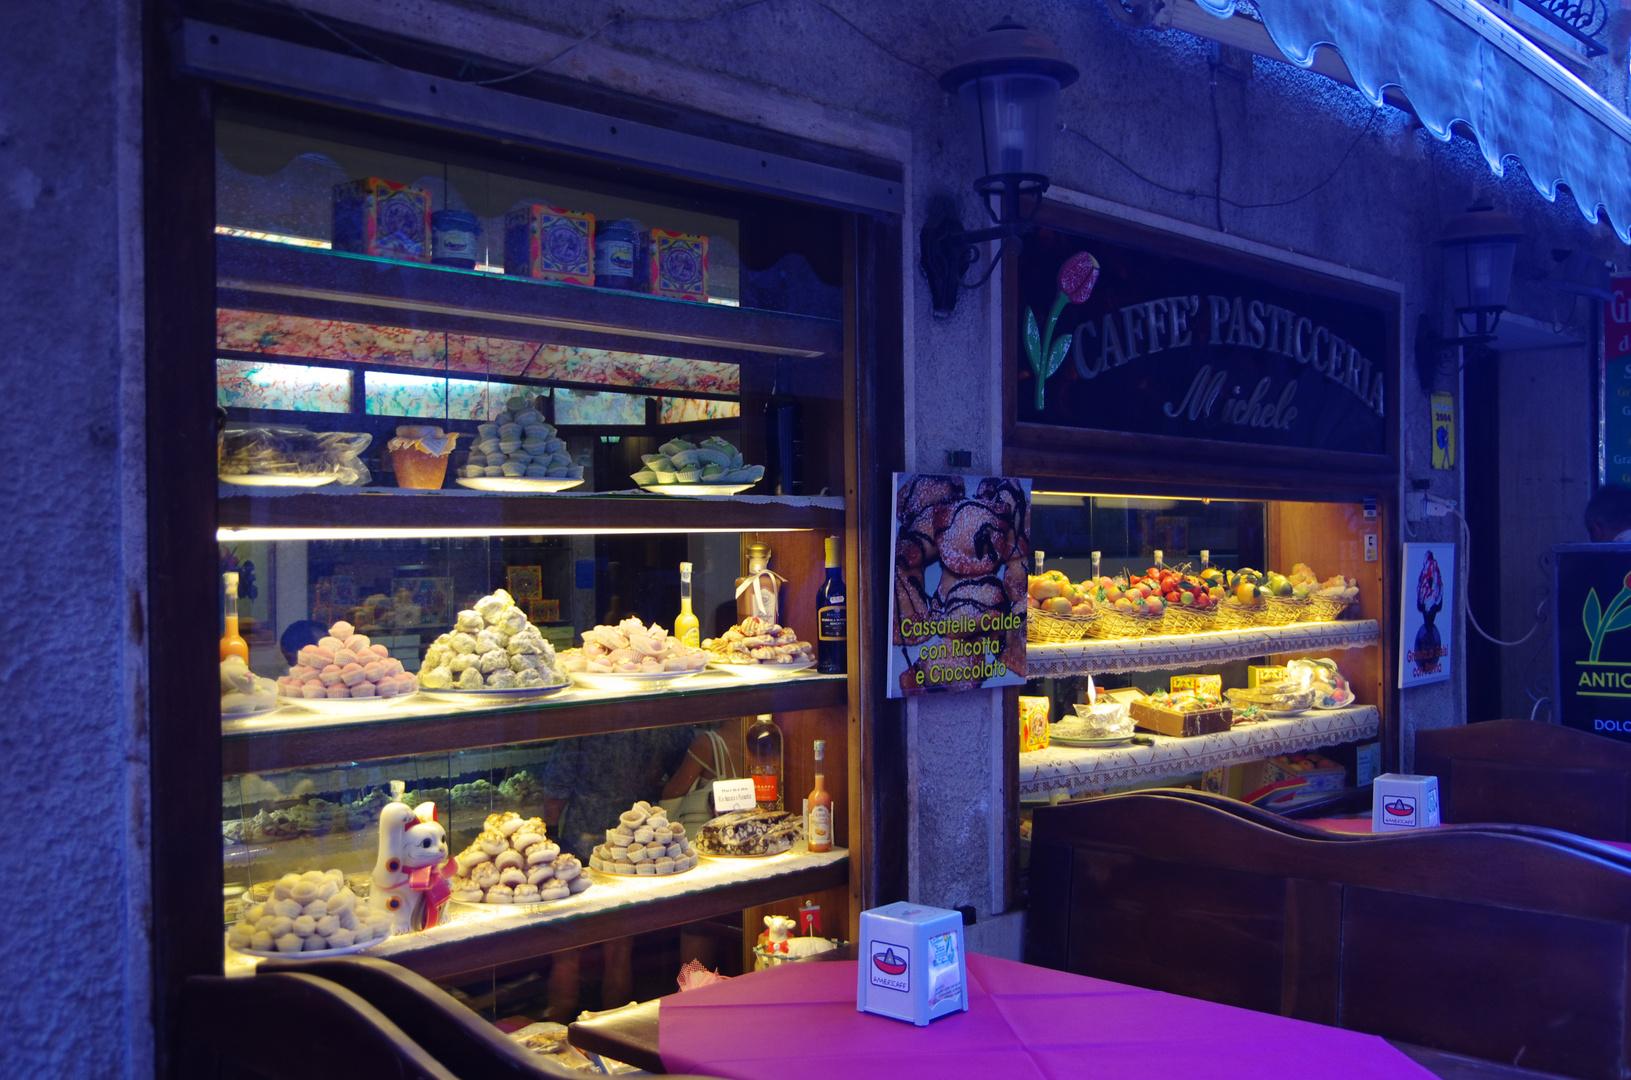 Café in Sicile